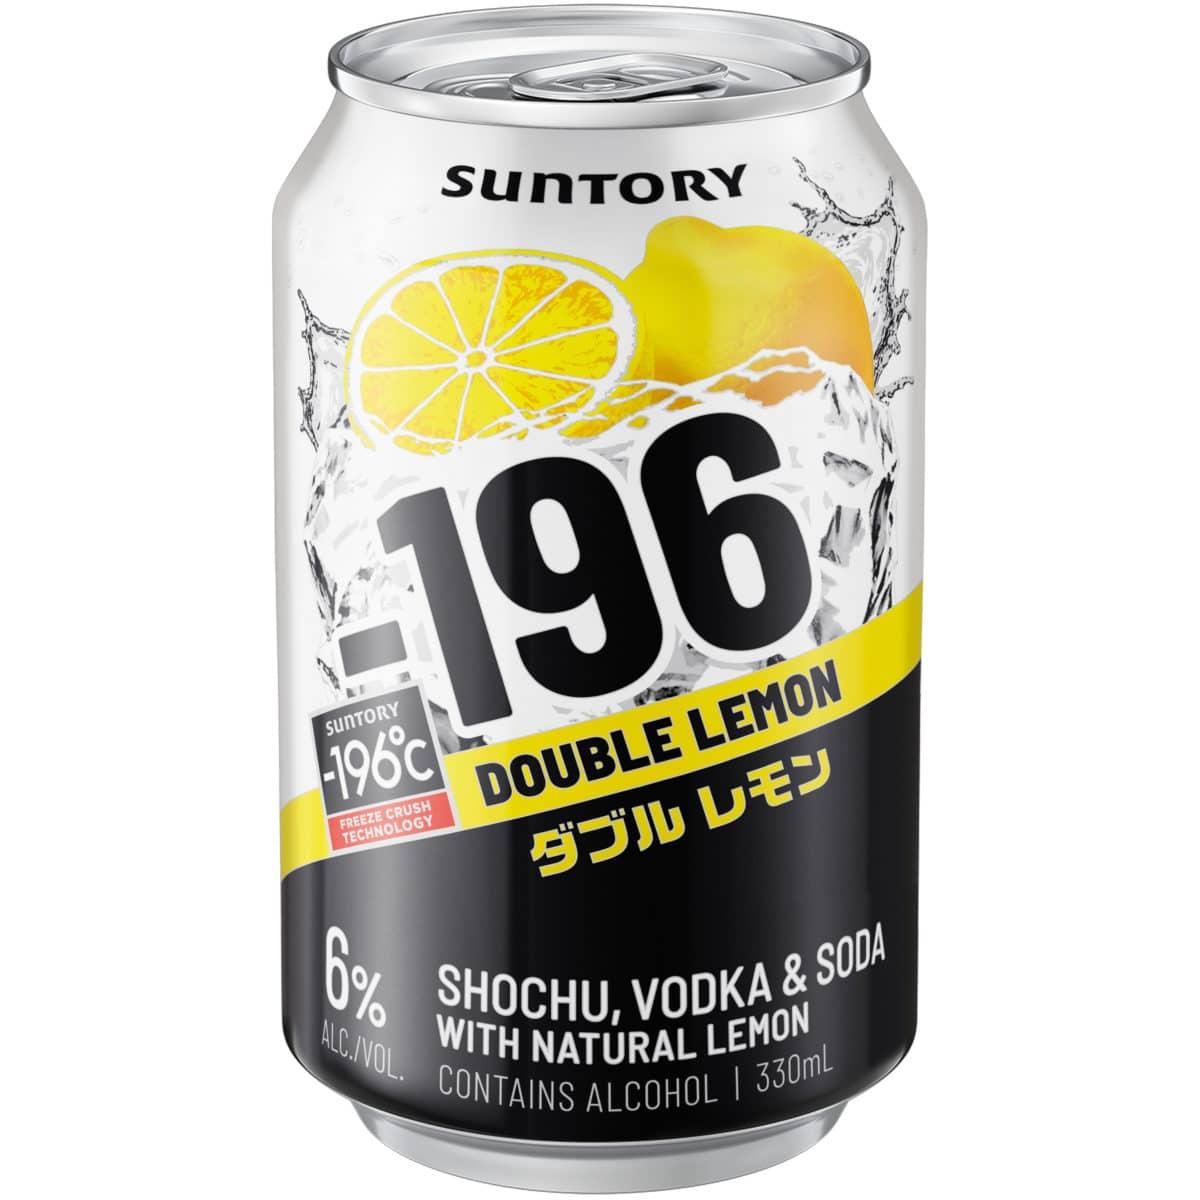 -196 double lemon strong zero australia